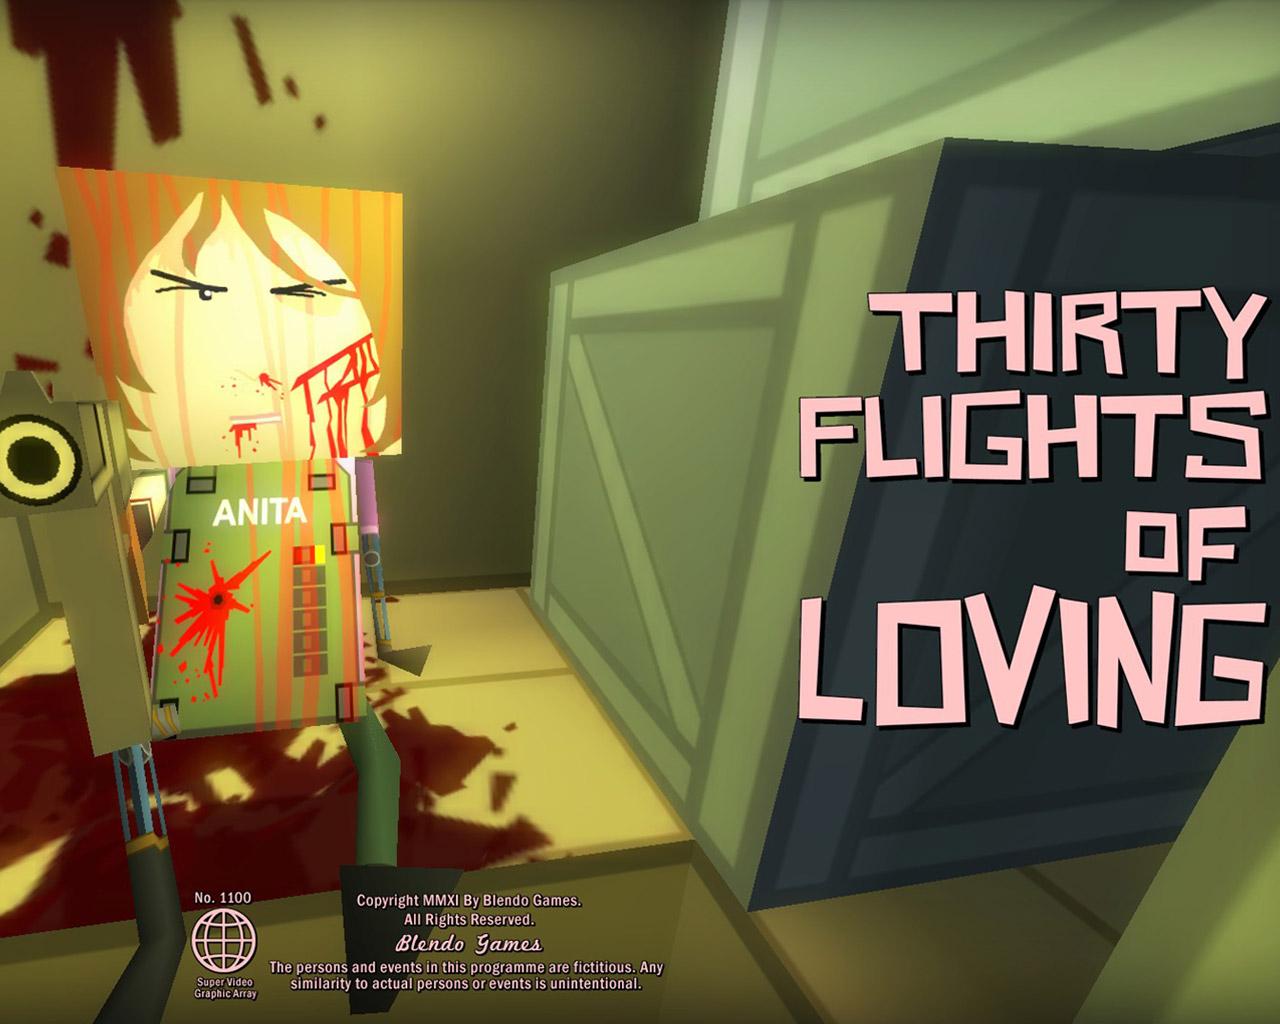 Free Thirty Flights of Loving Wallpaper in 1280x1024